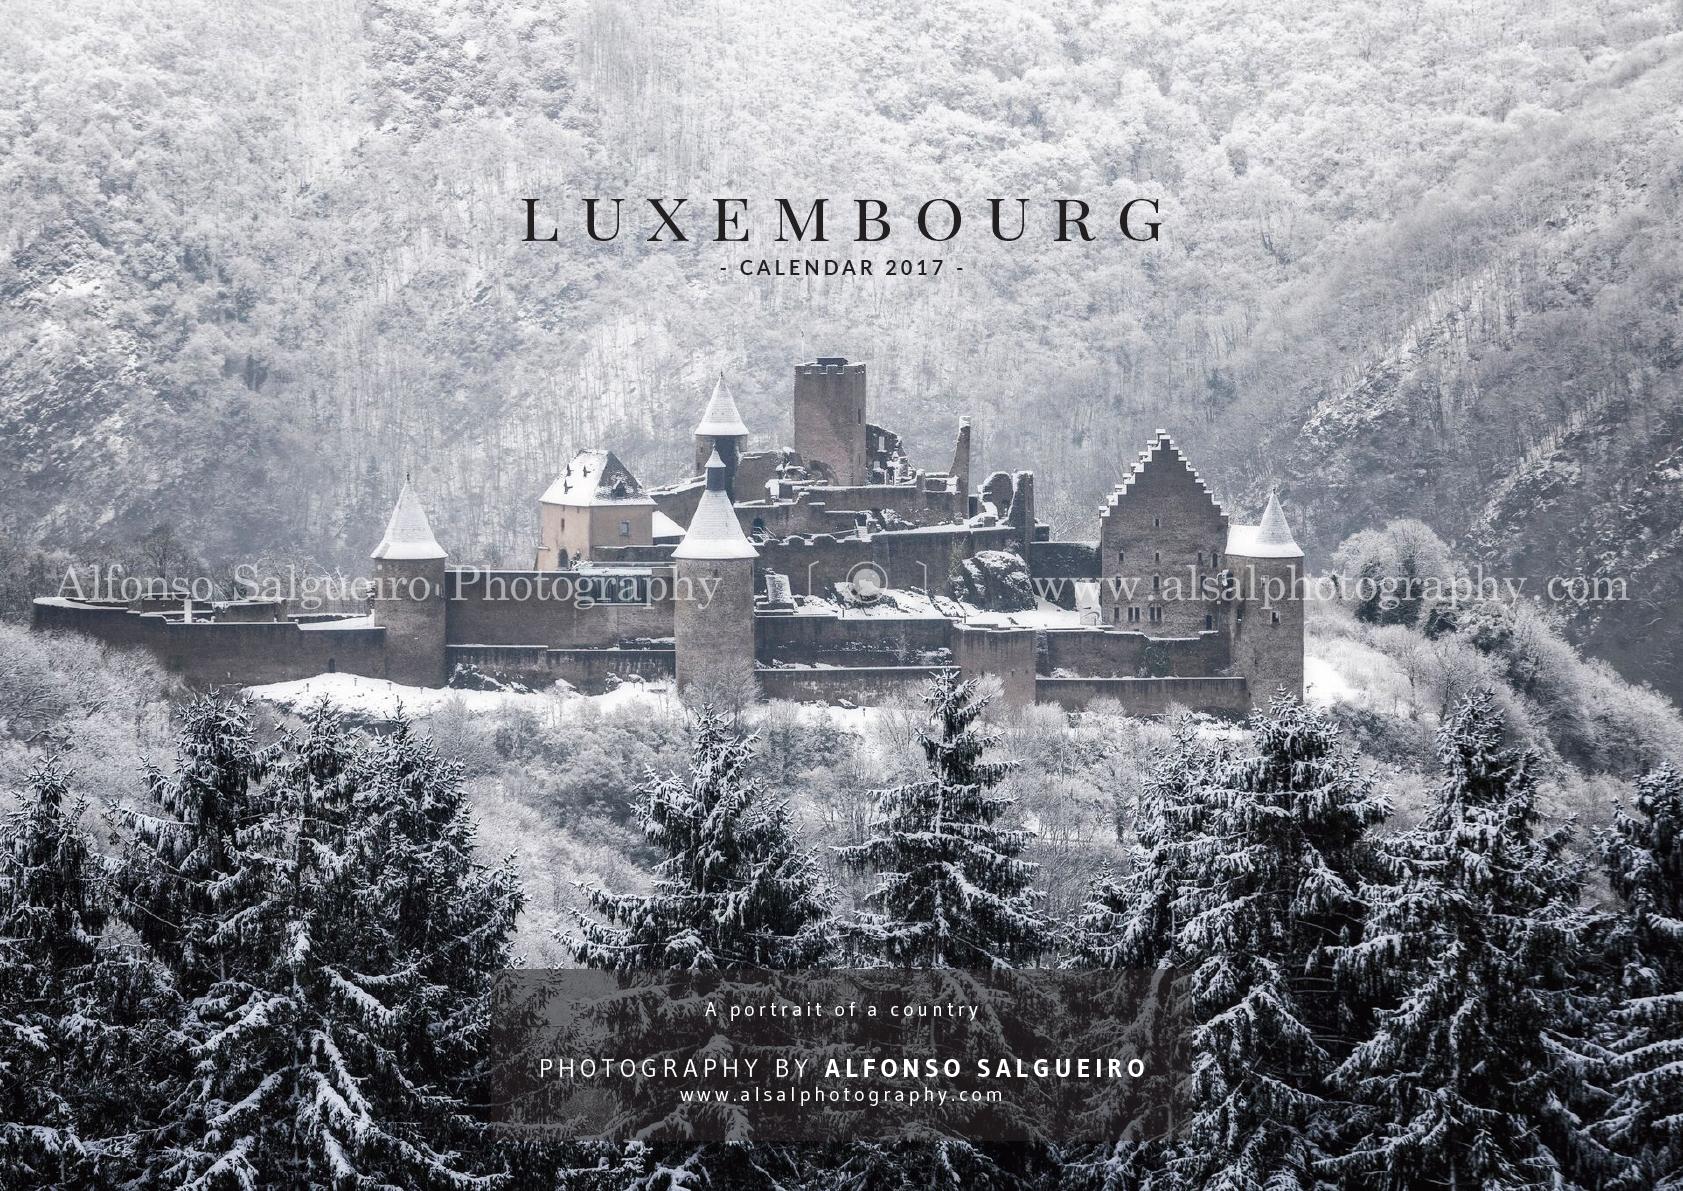 Luxembourg 2017 calendar.jpg